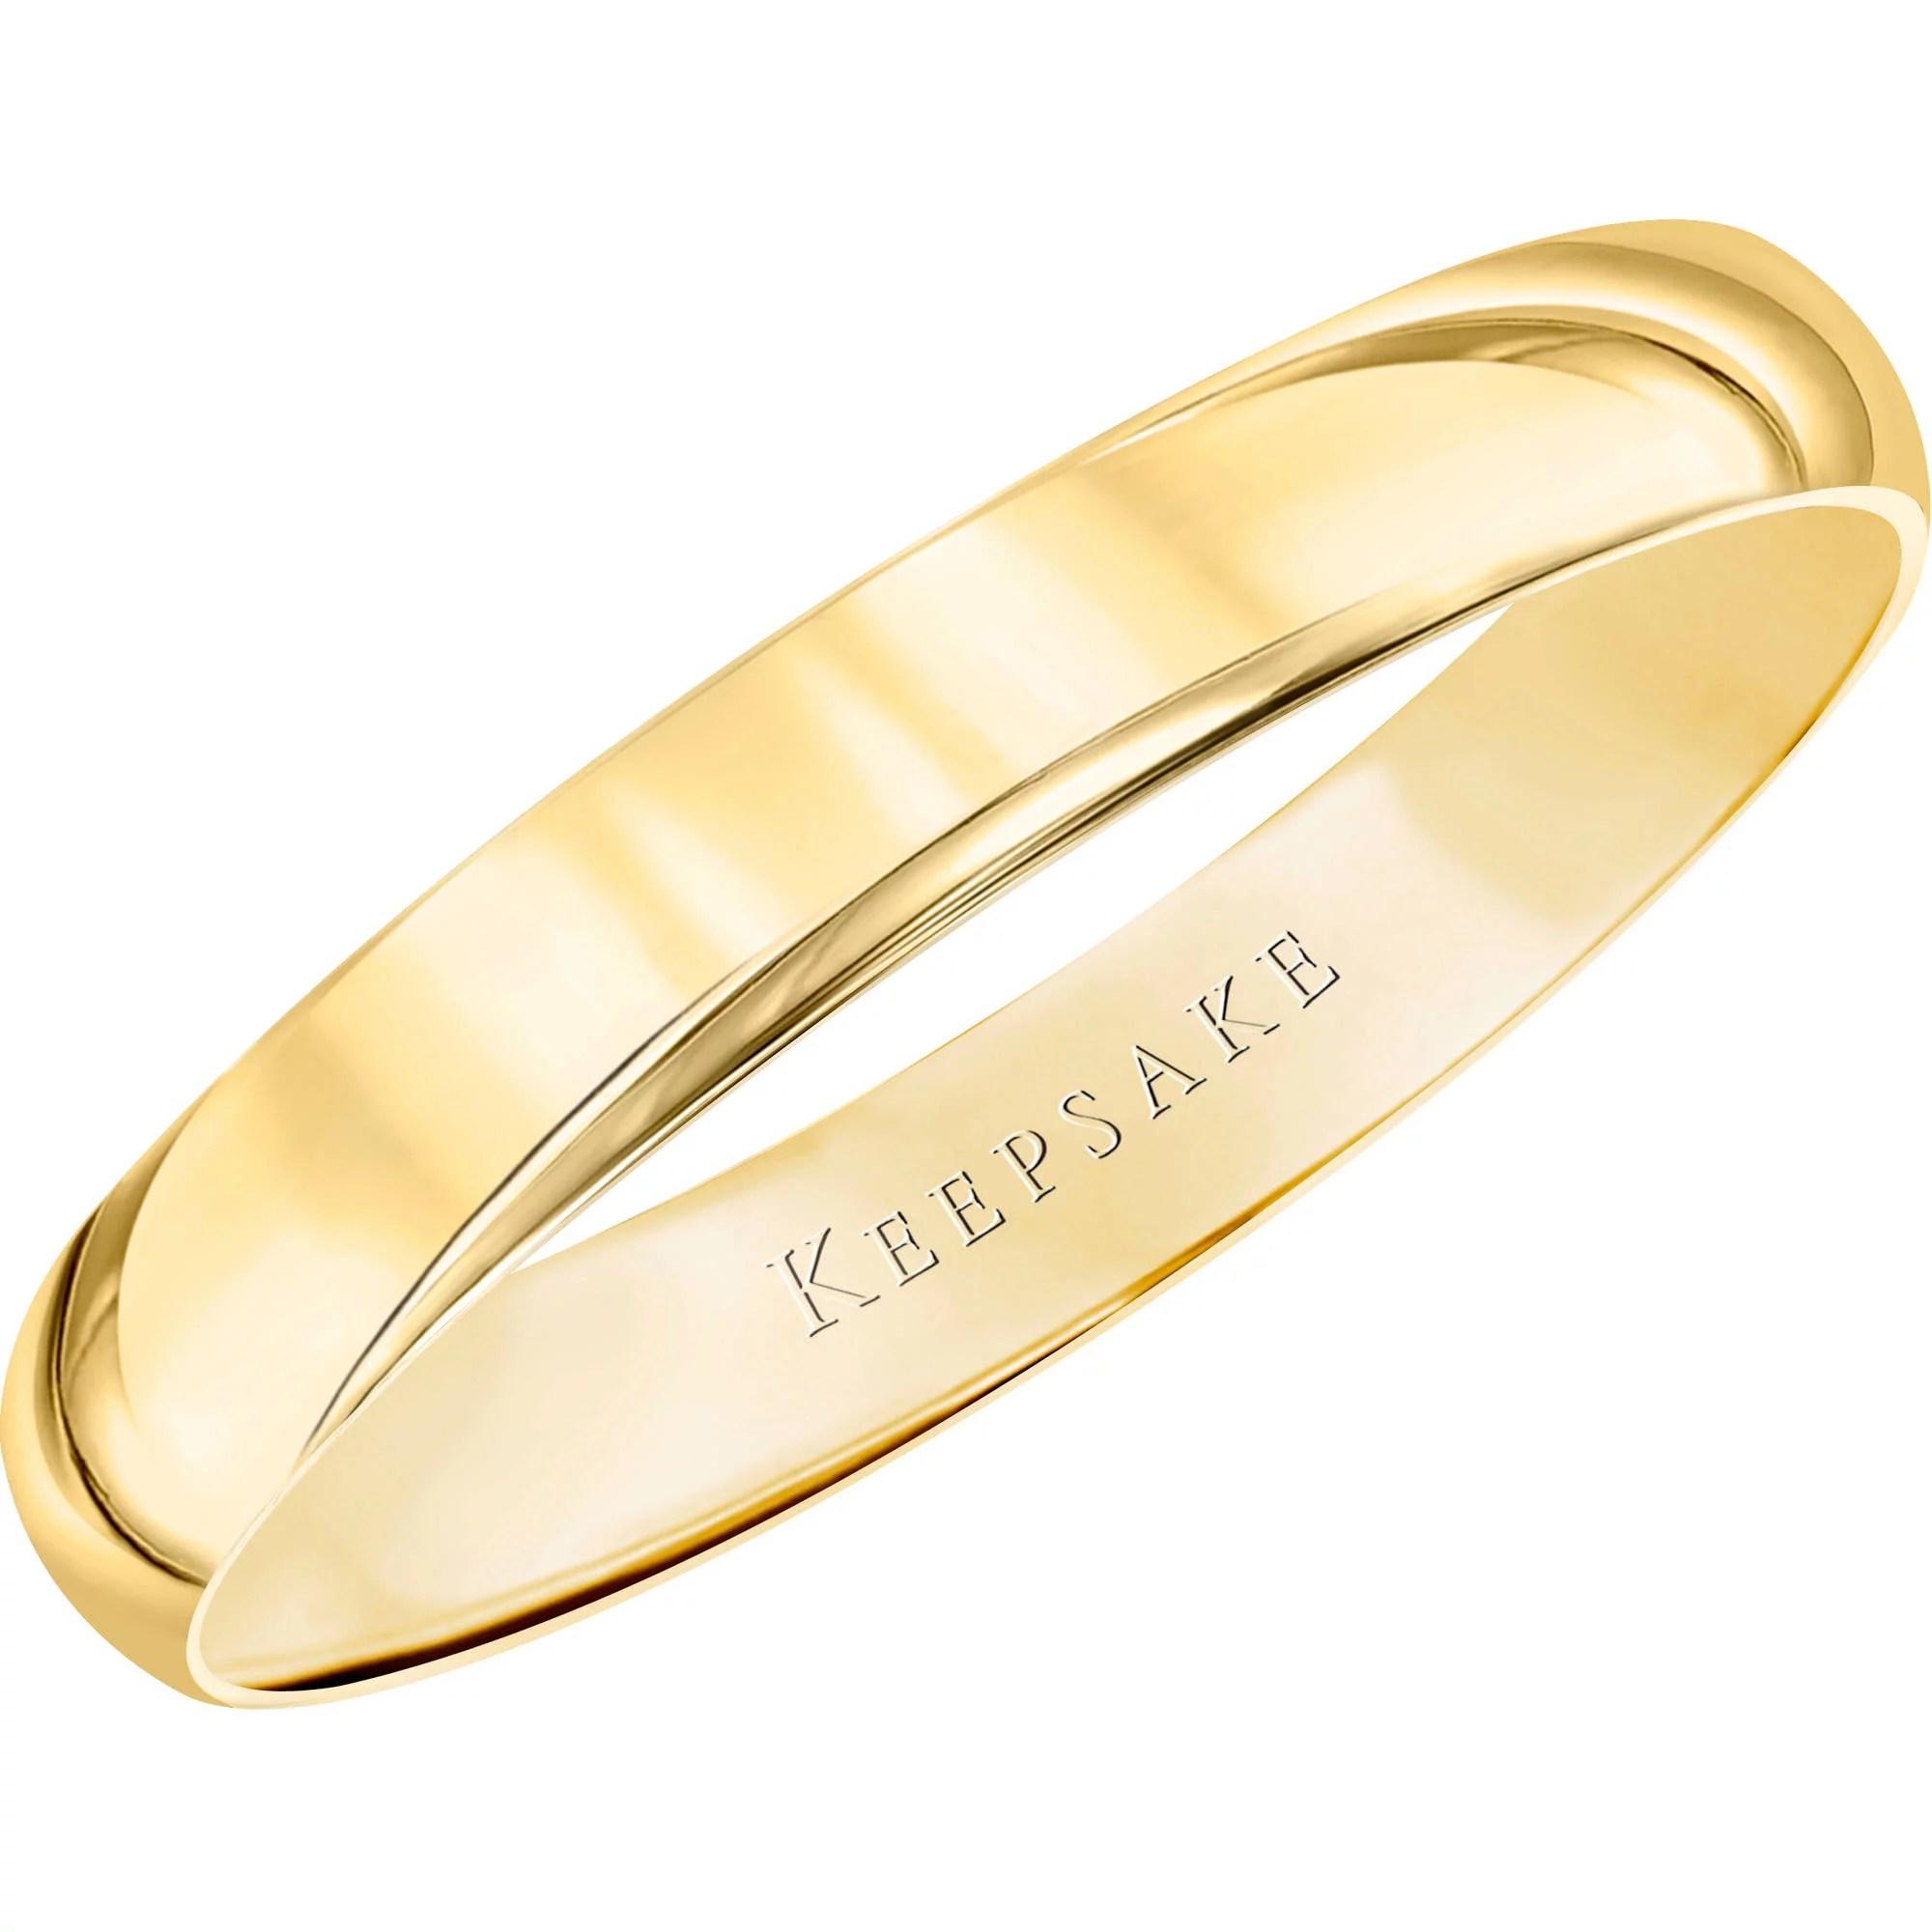 walmart jewelry wedding sets Keepsake 10kt Yellow Gold Wedding Band With High Polish Finish 3mm